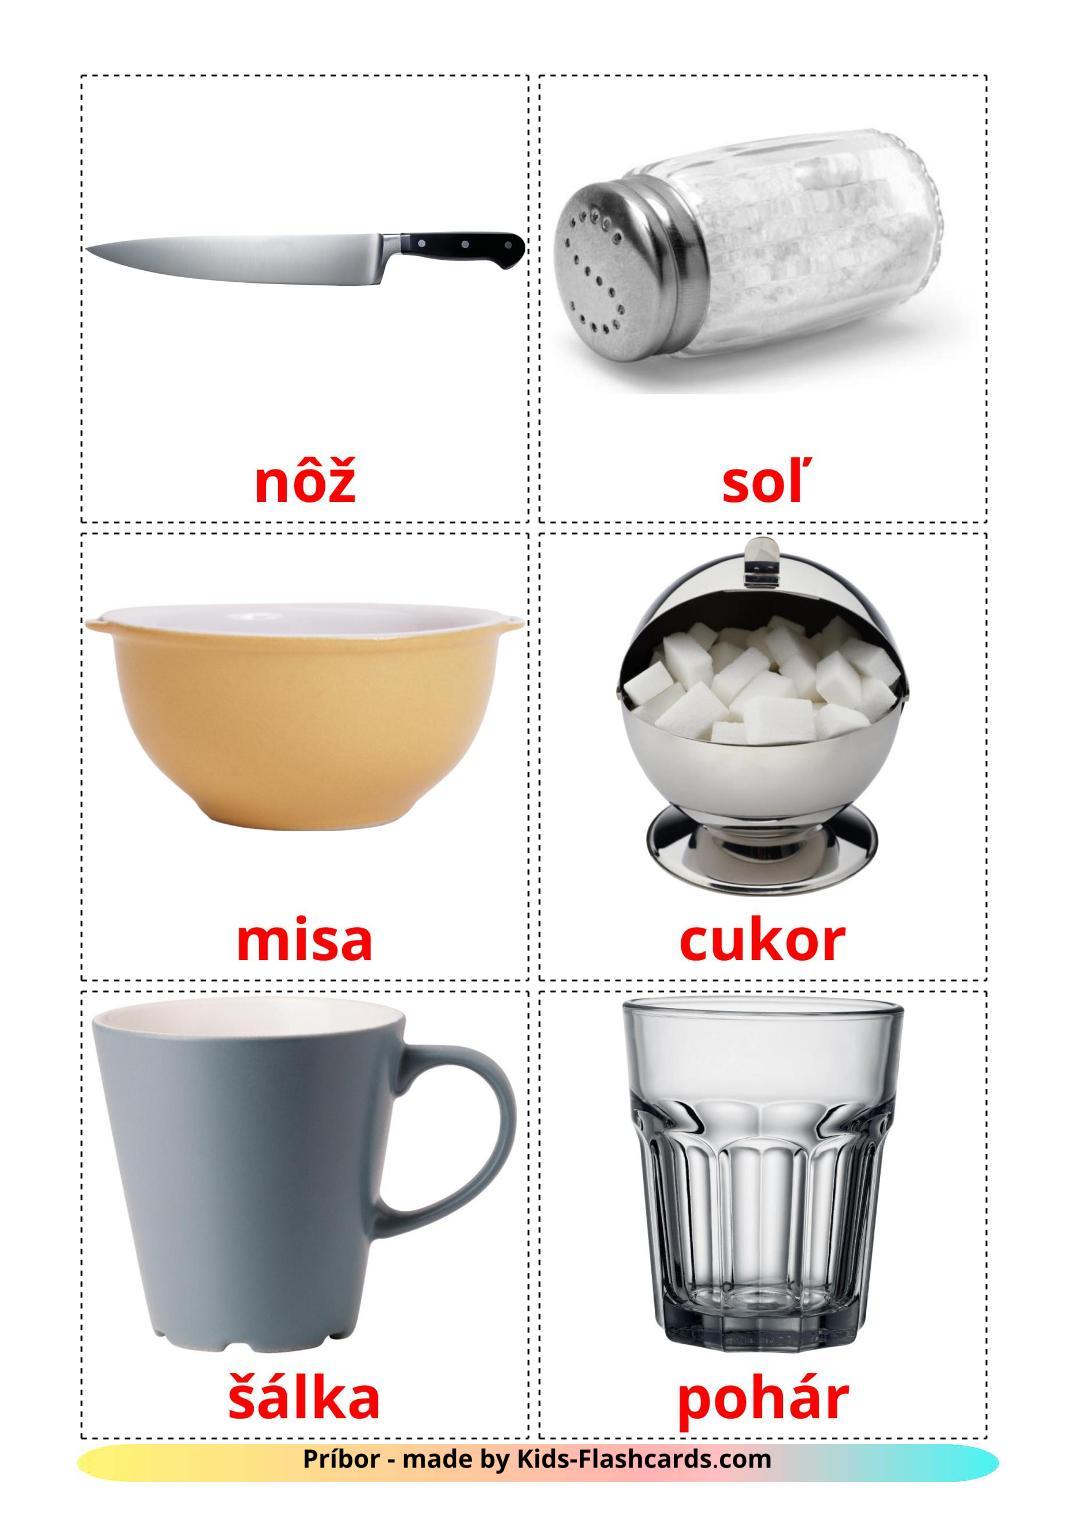 Crockery and cutlery - 29 Free Printable slovak Flashcards